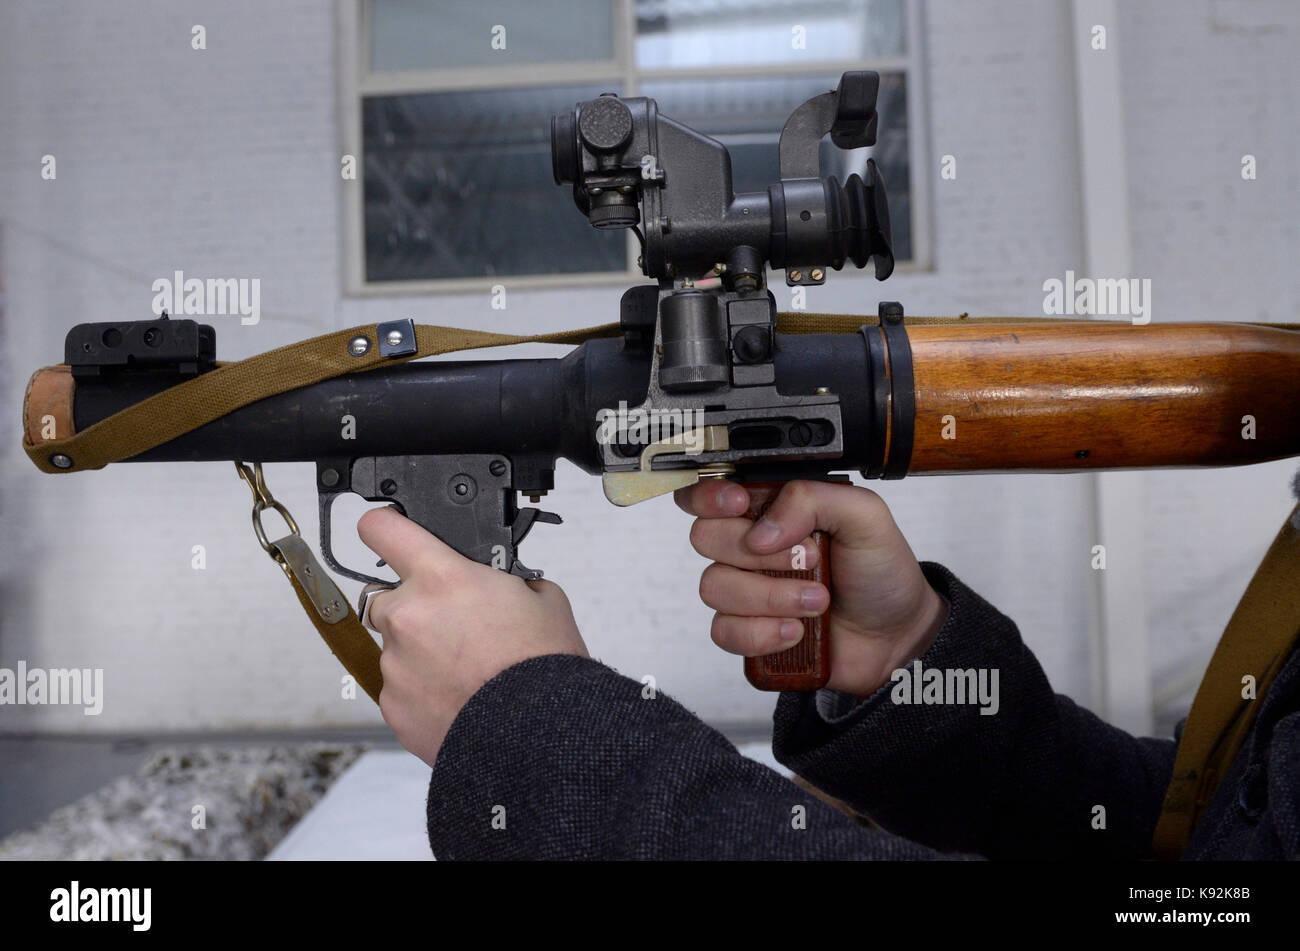 Hands holding a rocket-propelled grenades - Stock Image